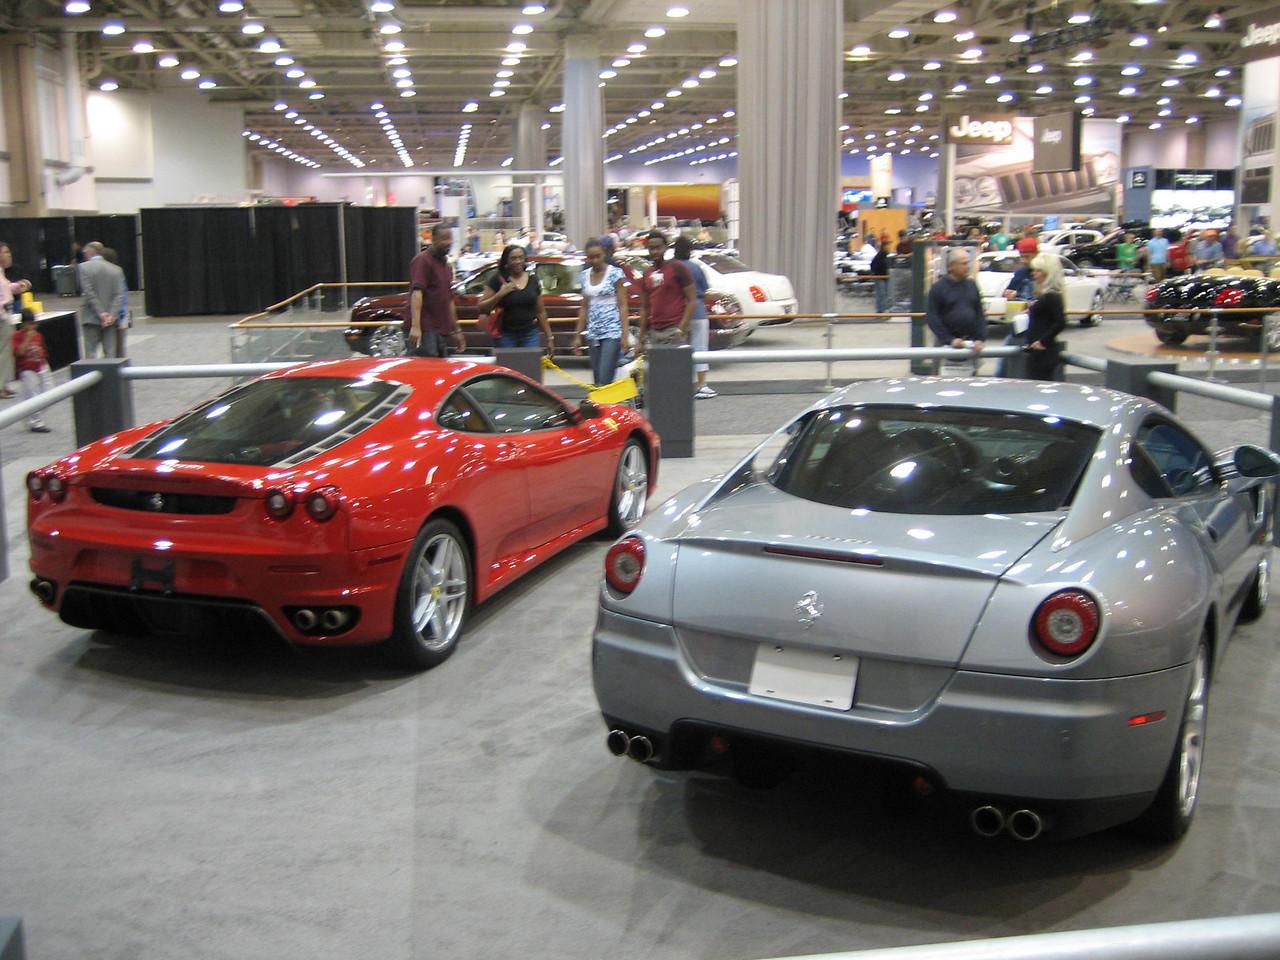 Ferrari F430 and 599 GB